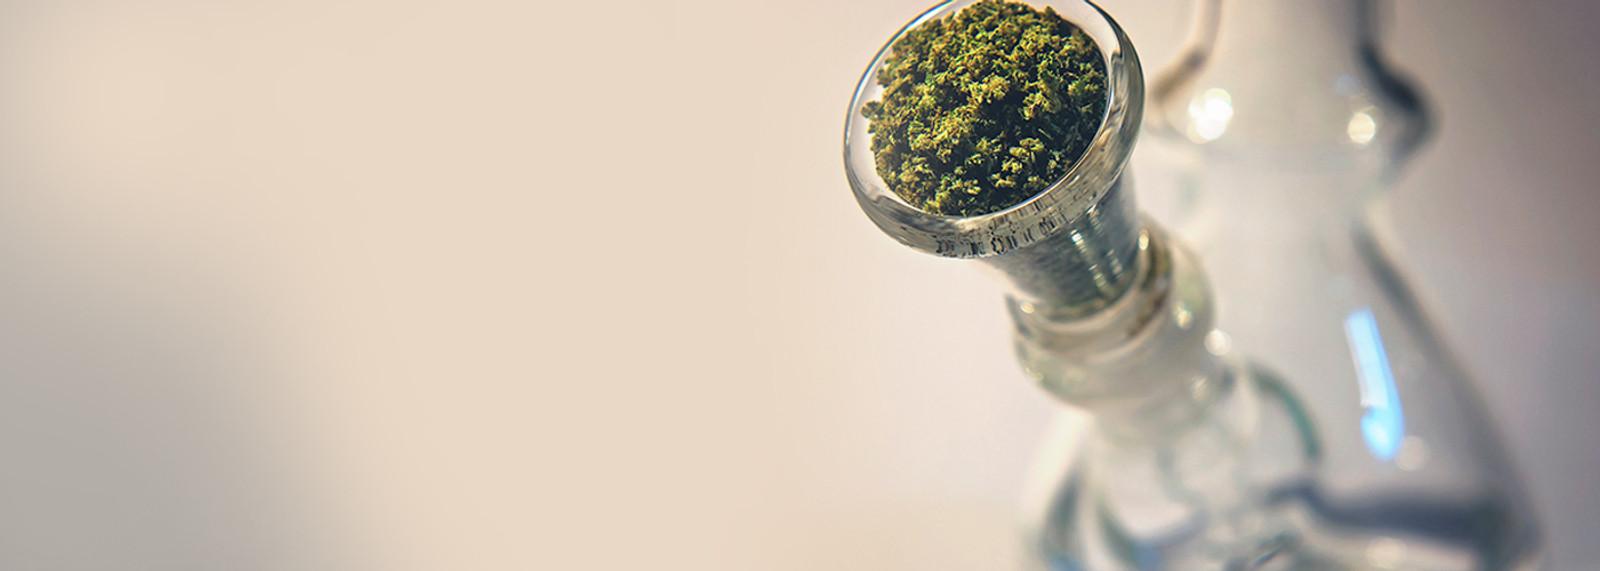 Herb Accessories